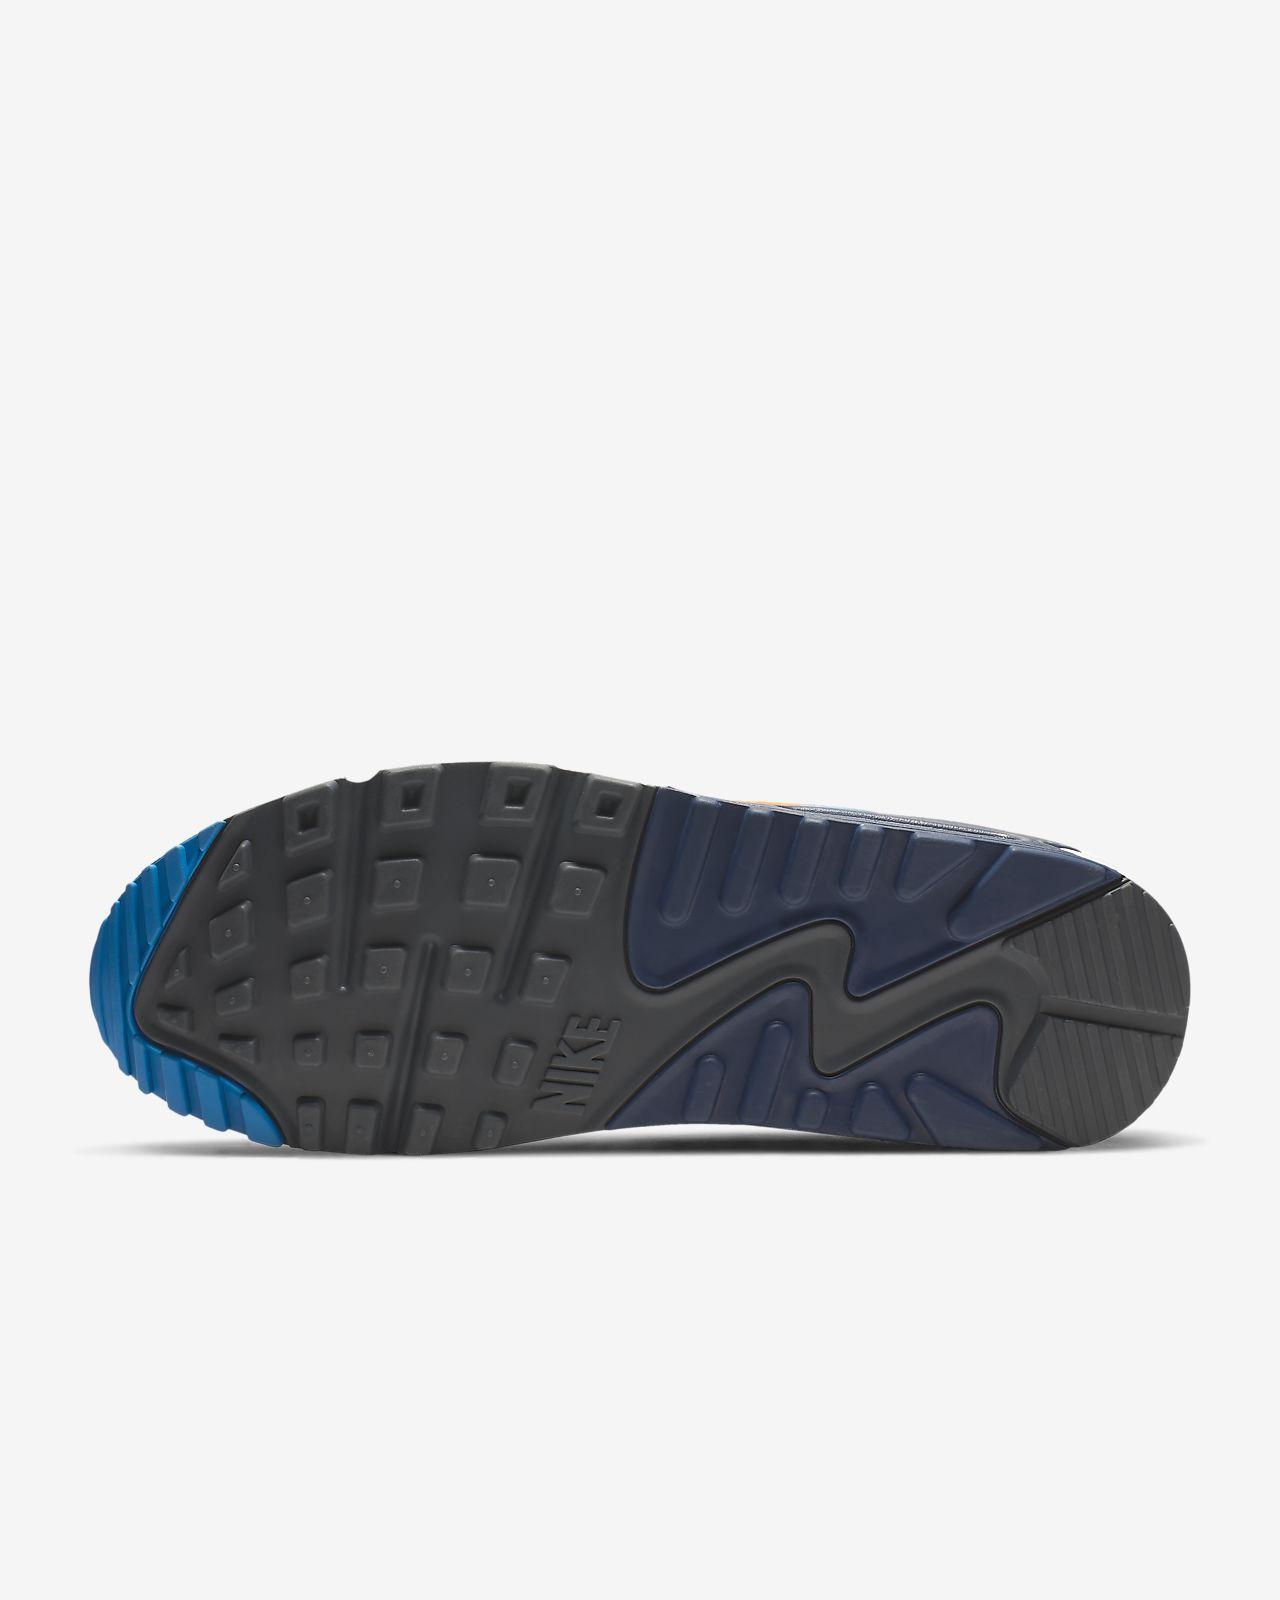 MENS NIKE AIR Max 90 Essential AJ1285 403 Trainers Navy Shoes